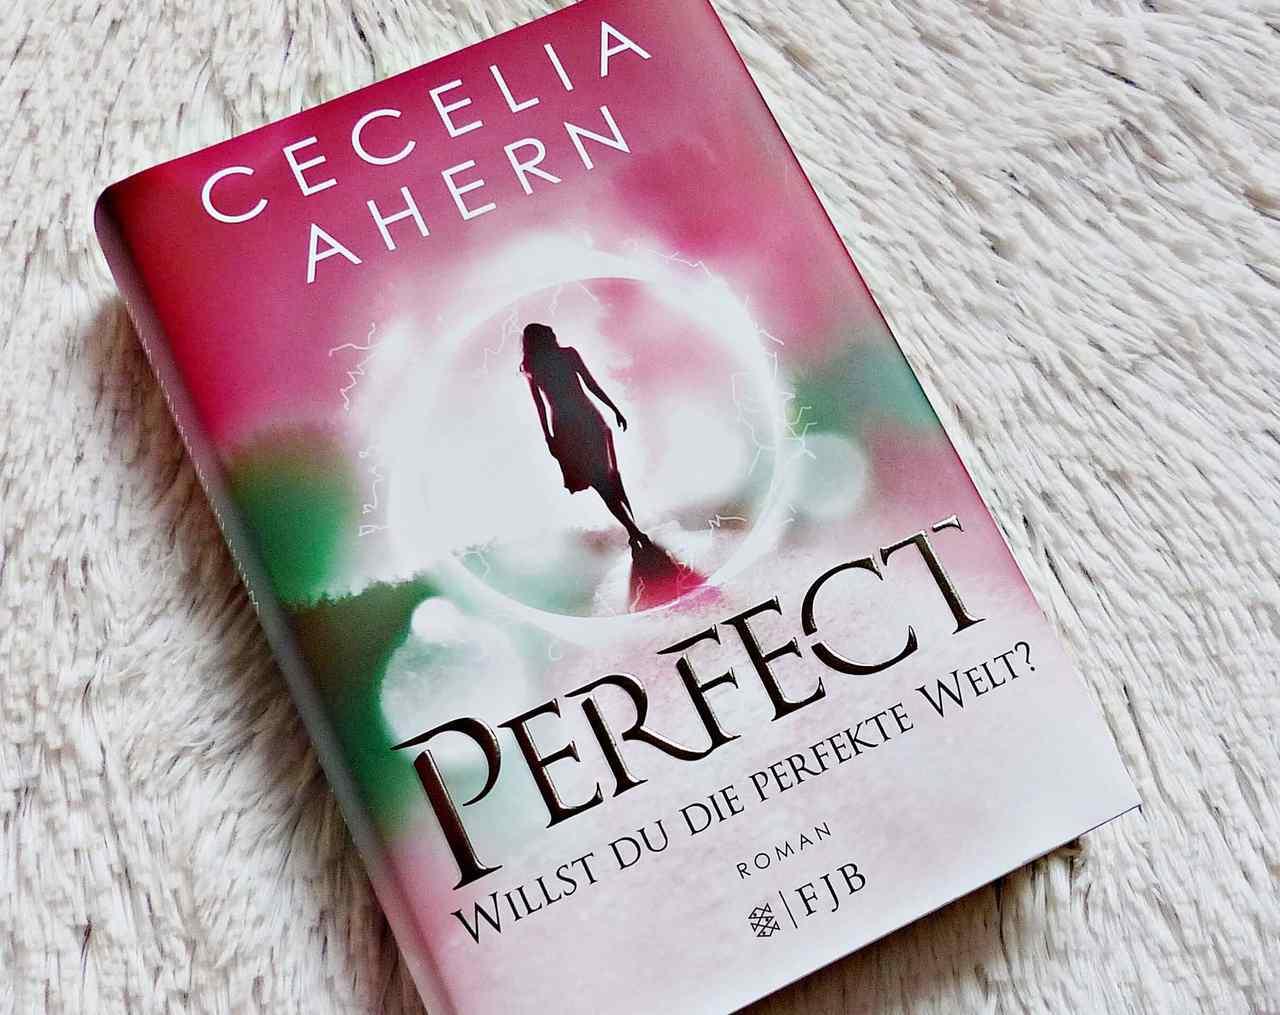 Rezension | Cecelia Ahern – Perfect. Willst du die perfekte Welt? | Band 2